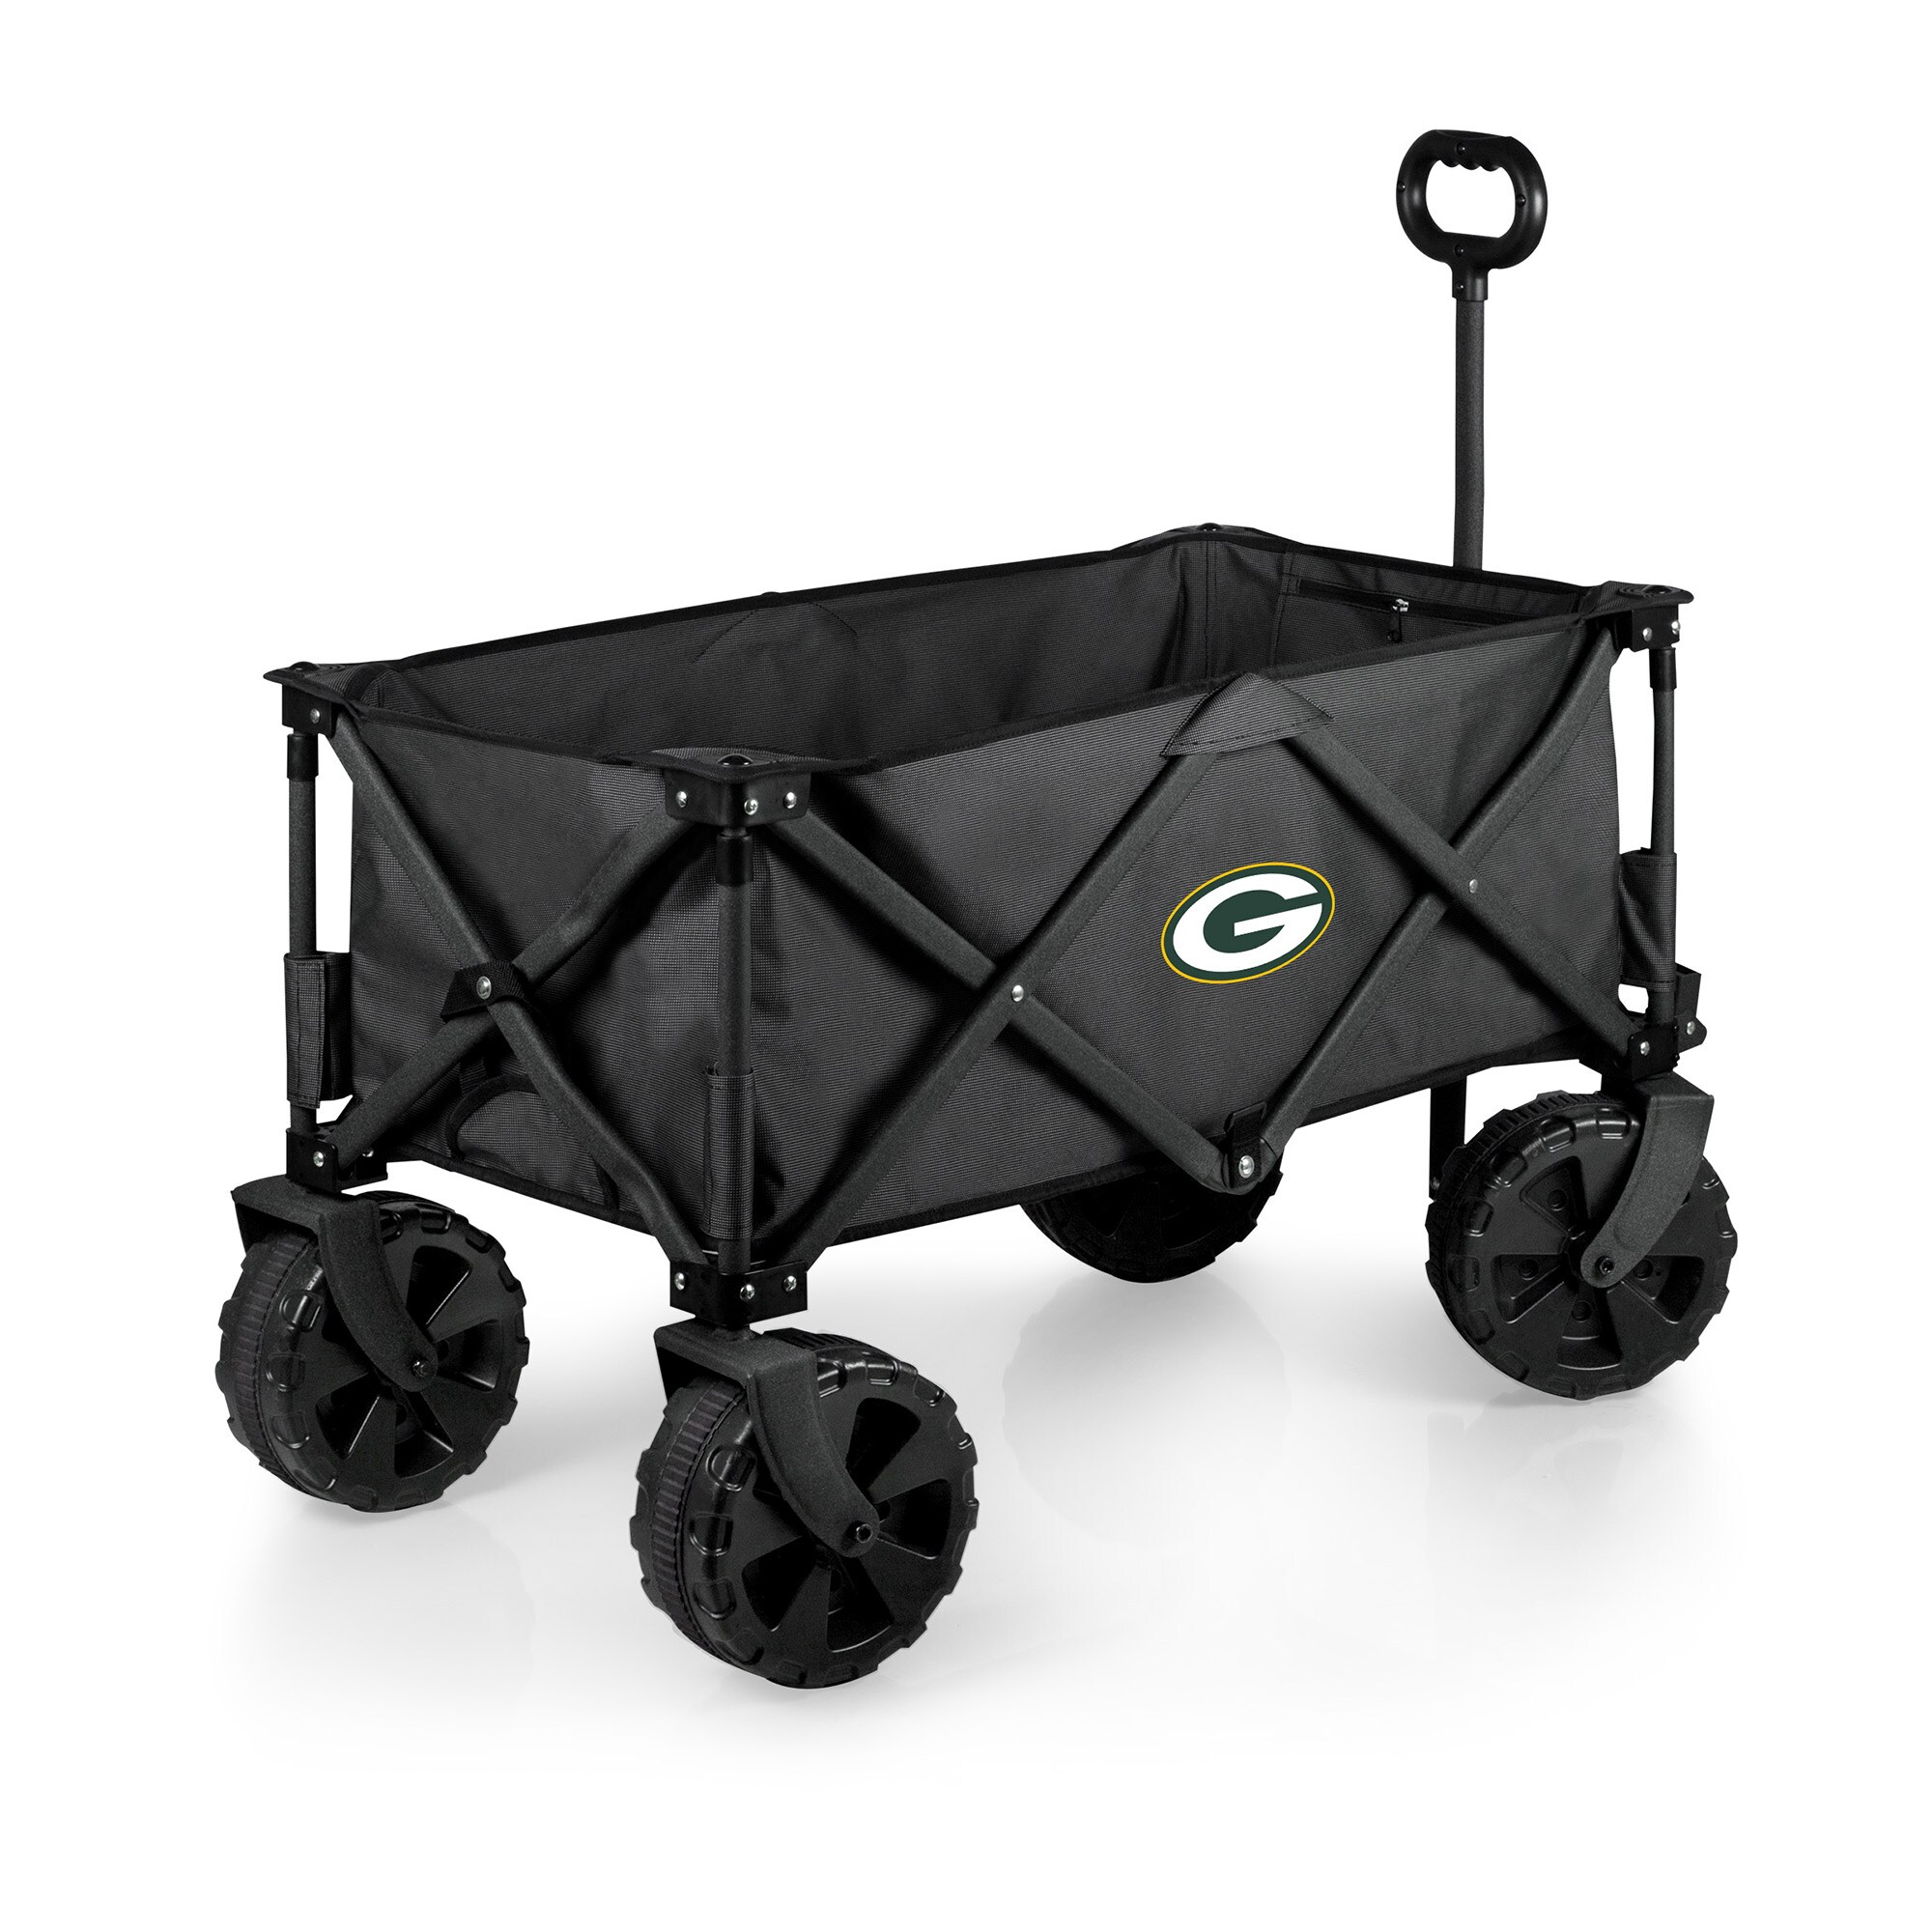 Green Bay Packers Adventure Wagon Elite All-Terrain Folding Utility Wagon - Charcoal